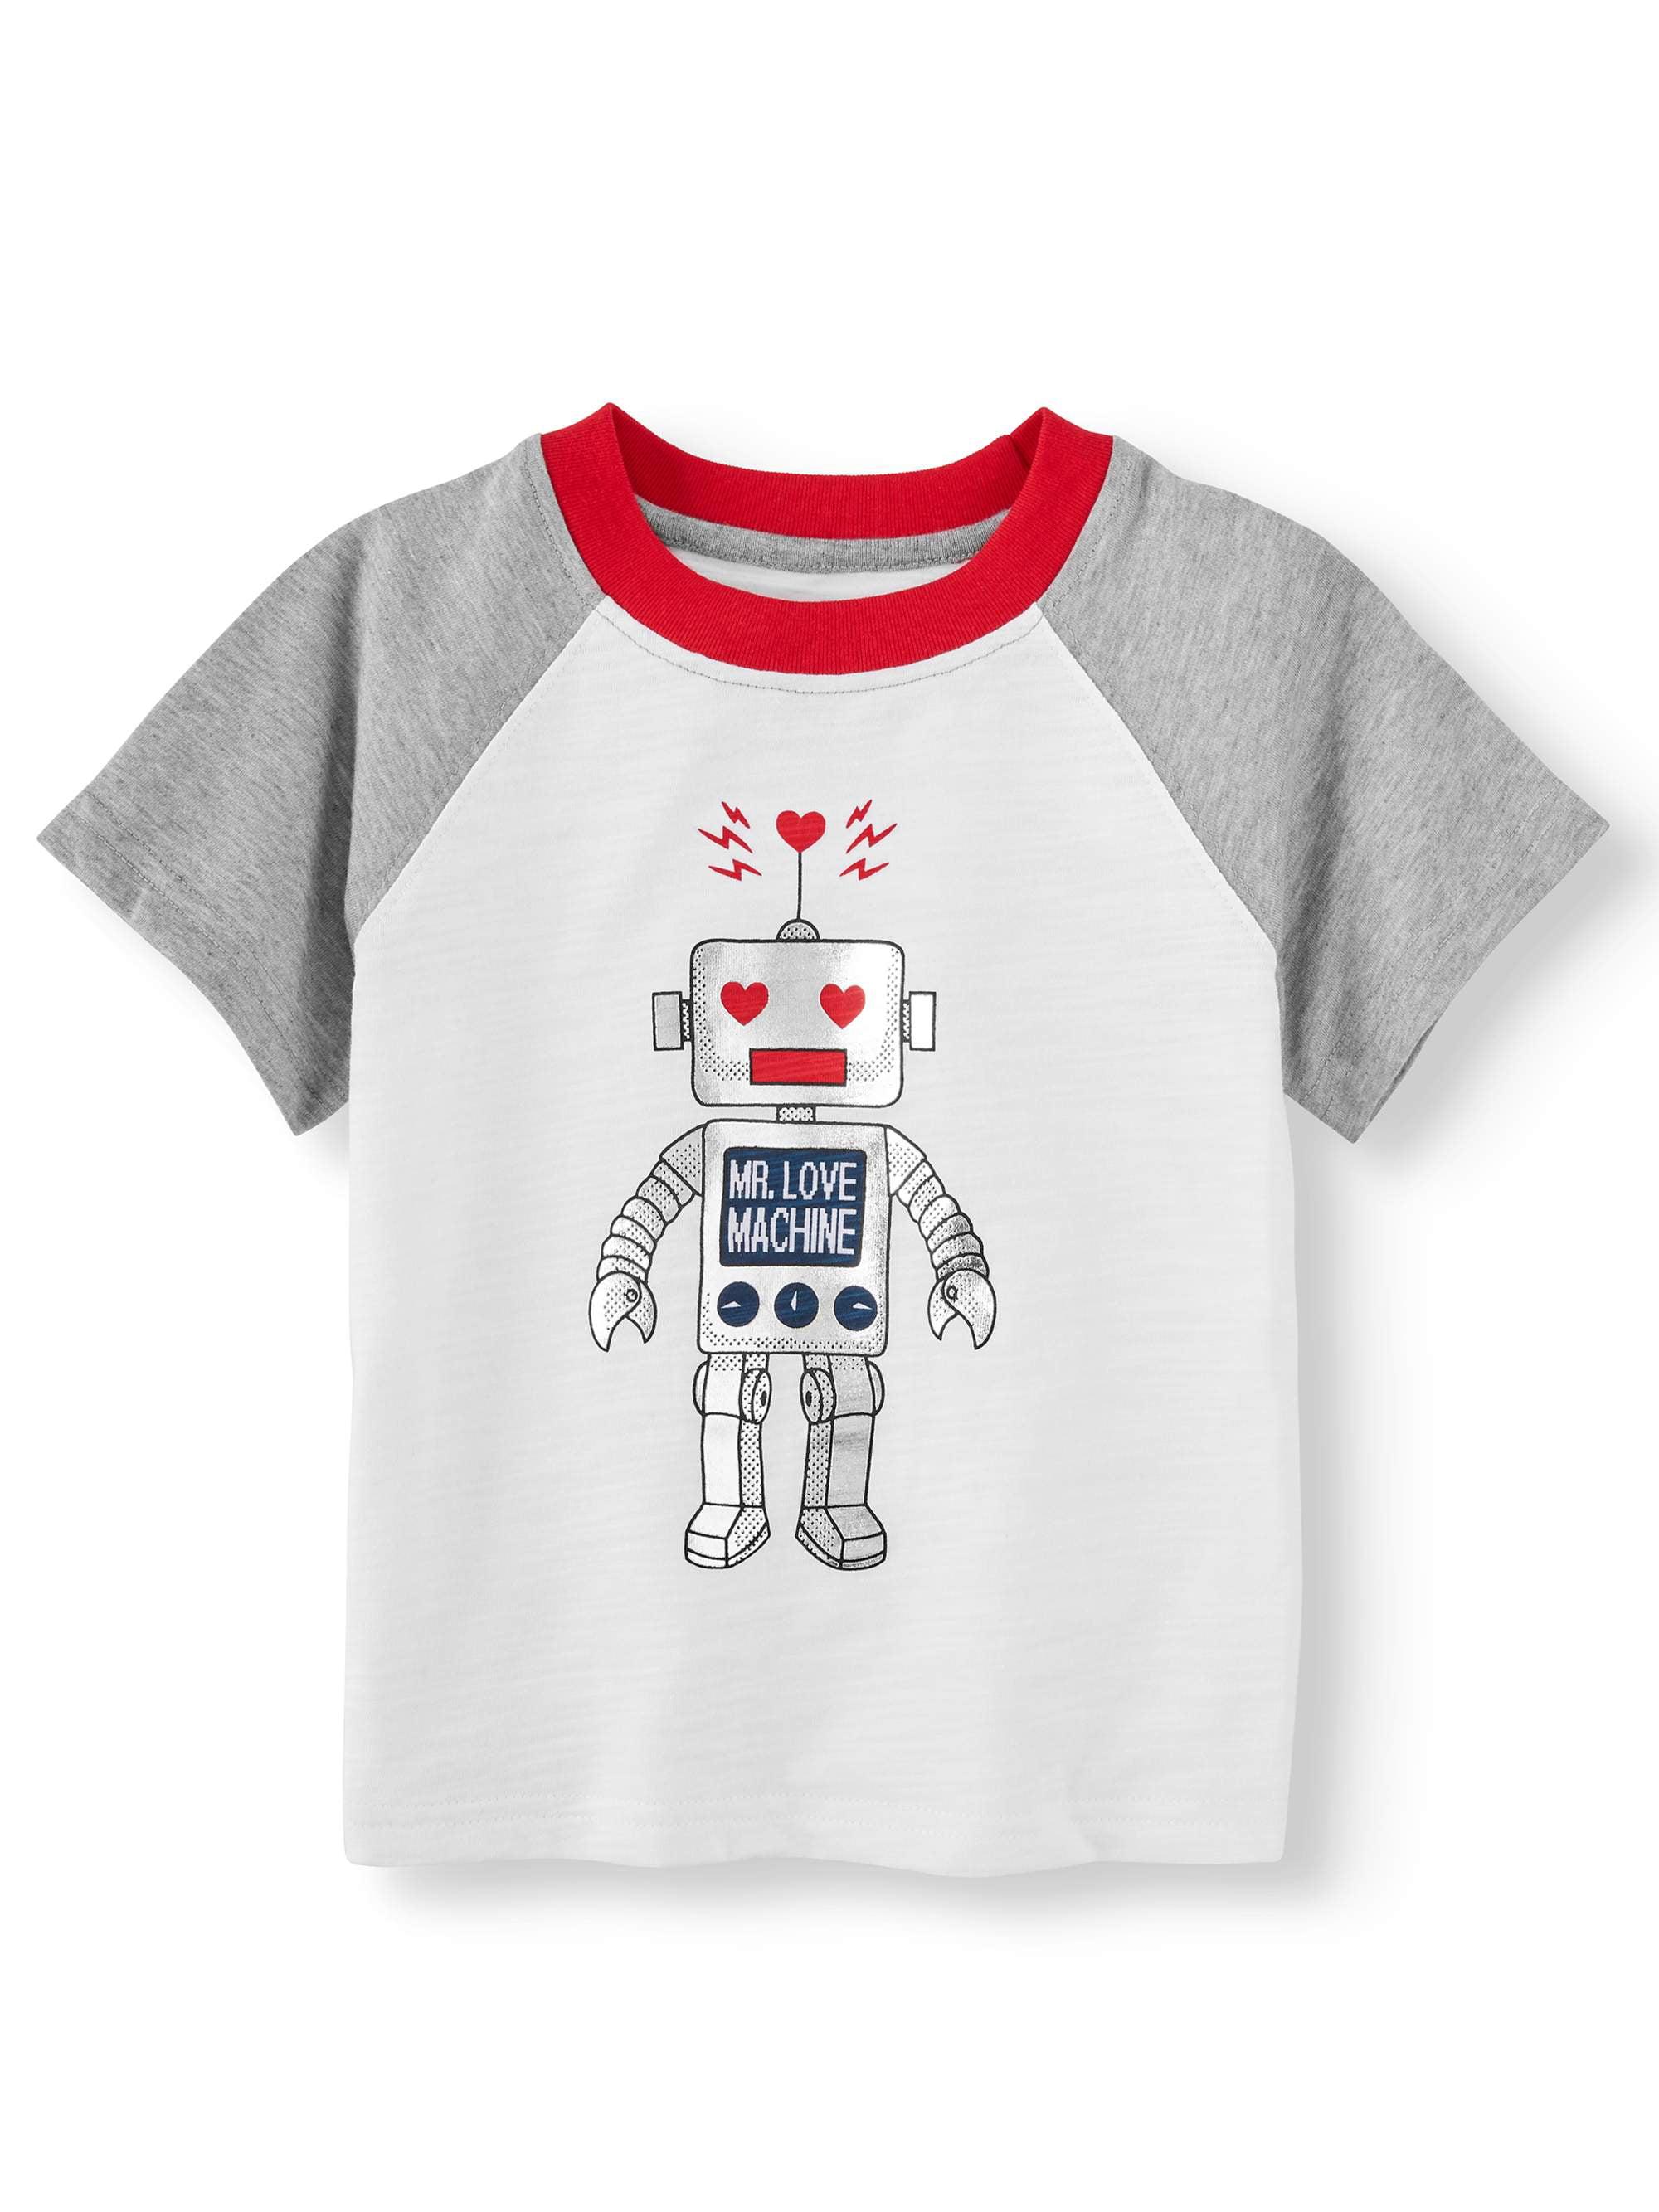 cdc474d67 Valentine's Day - Short Sleeve Raglan Graphic T-shirt (Toddler Boys) -  Walmart.com